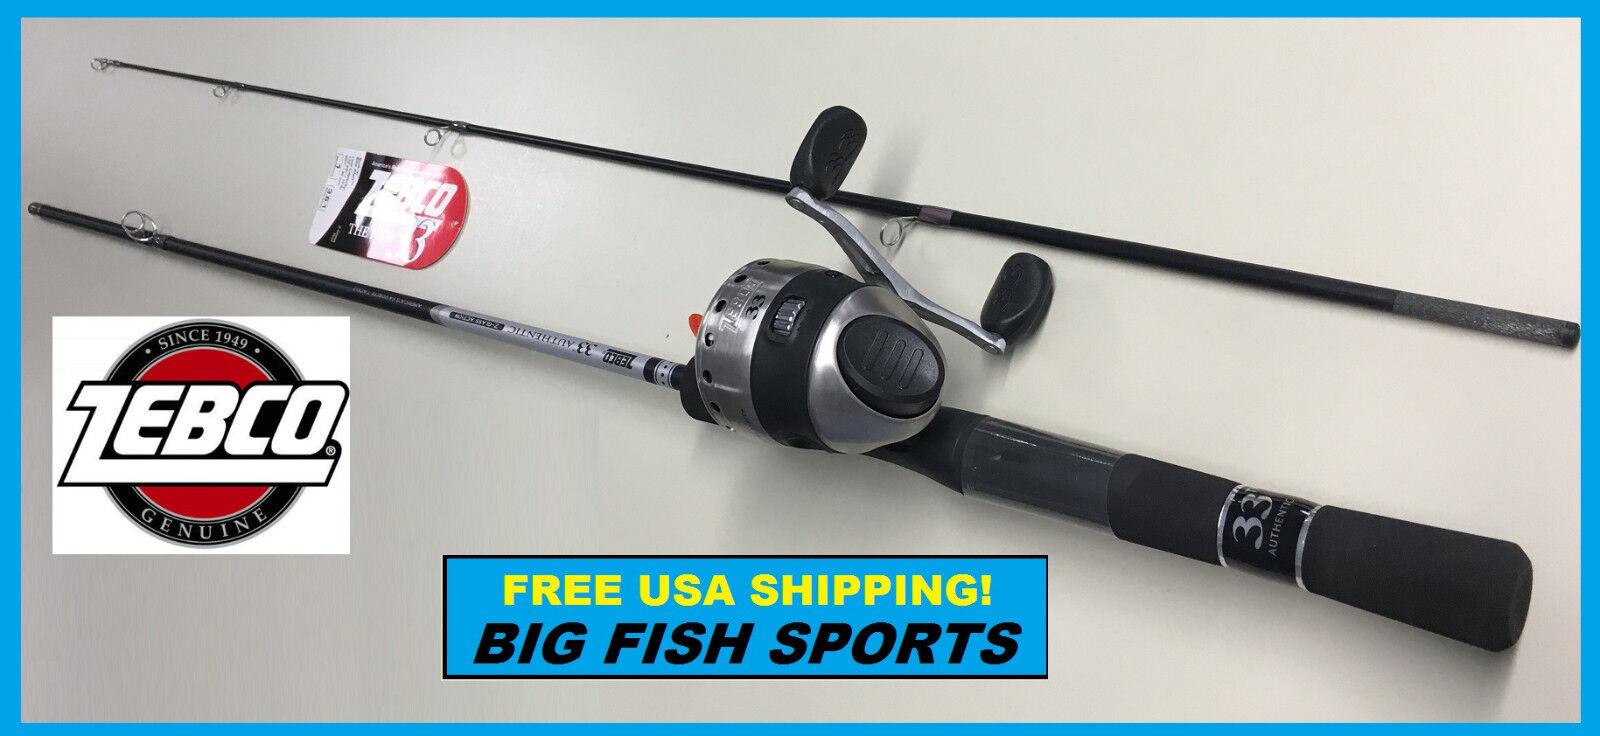 QUANTUM XTRALITE 6/' Fishing Combo Rod and Reel NEW #XTS05602UL FREE SHIPPING!